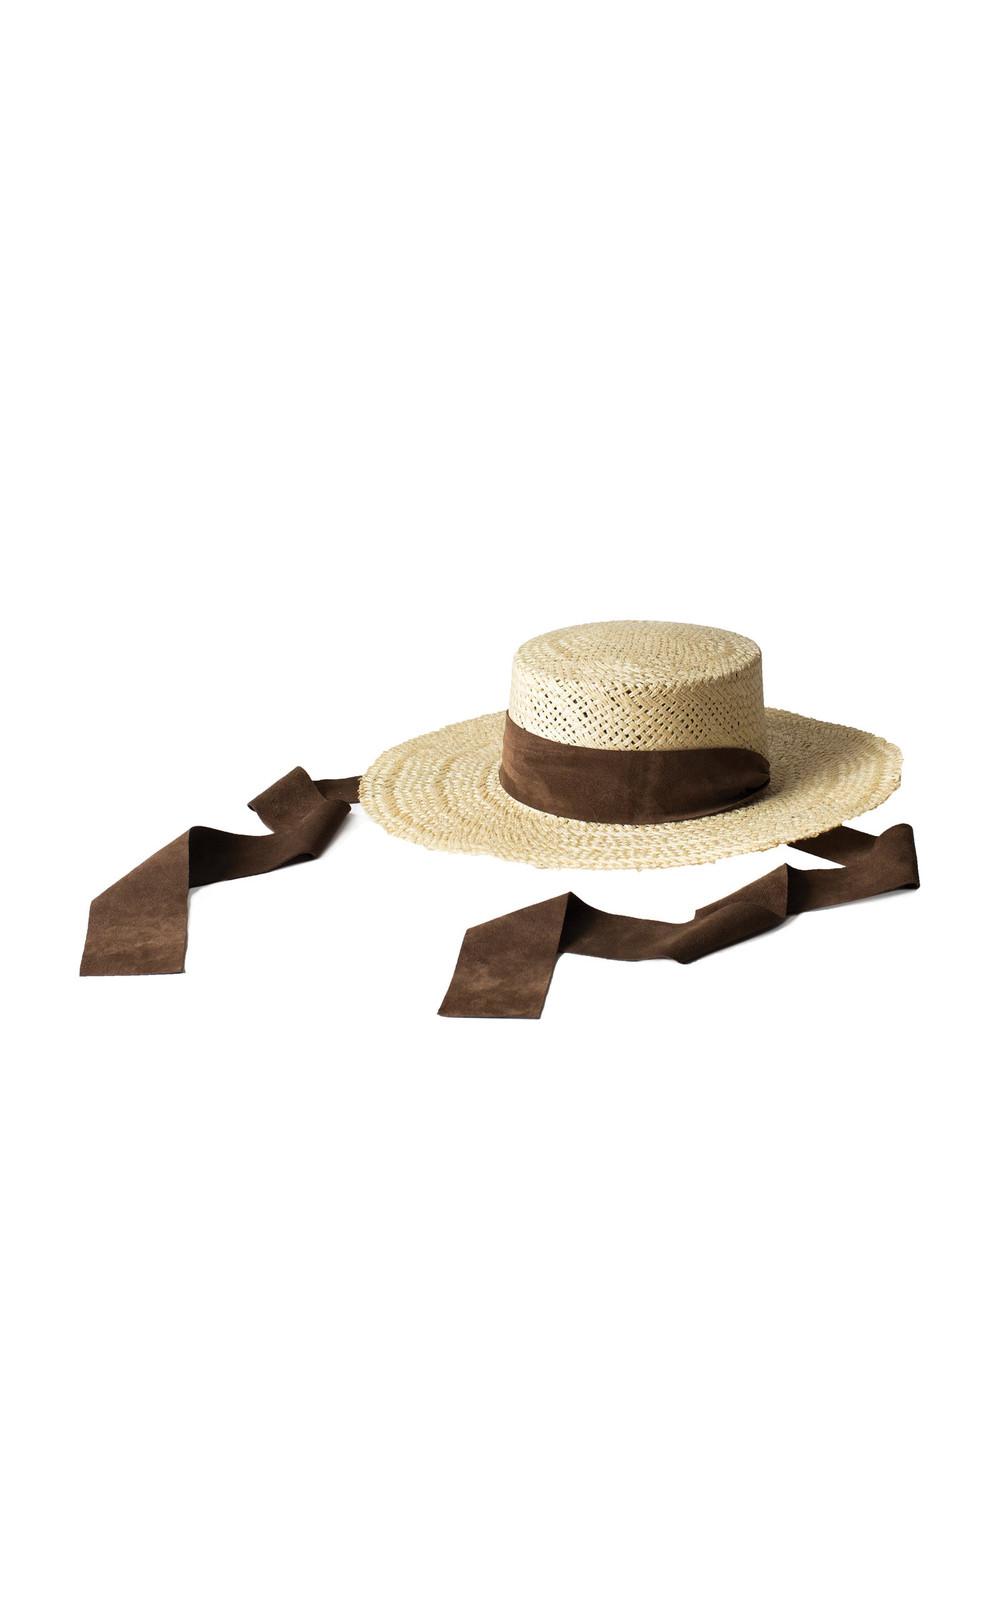 Janessa Leone Nina Suede-Trimmed Straw Hat in neutral